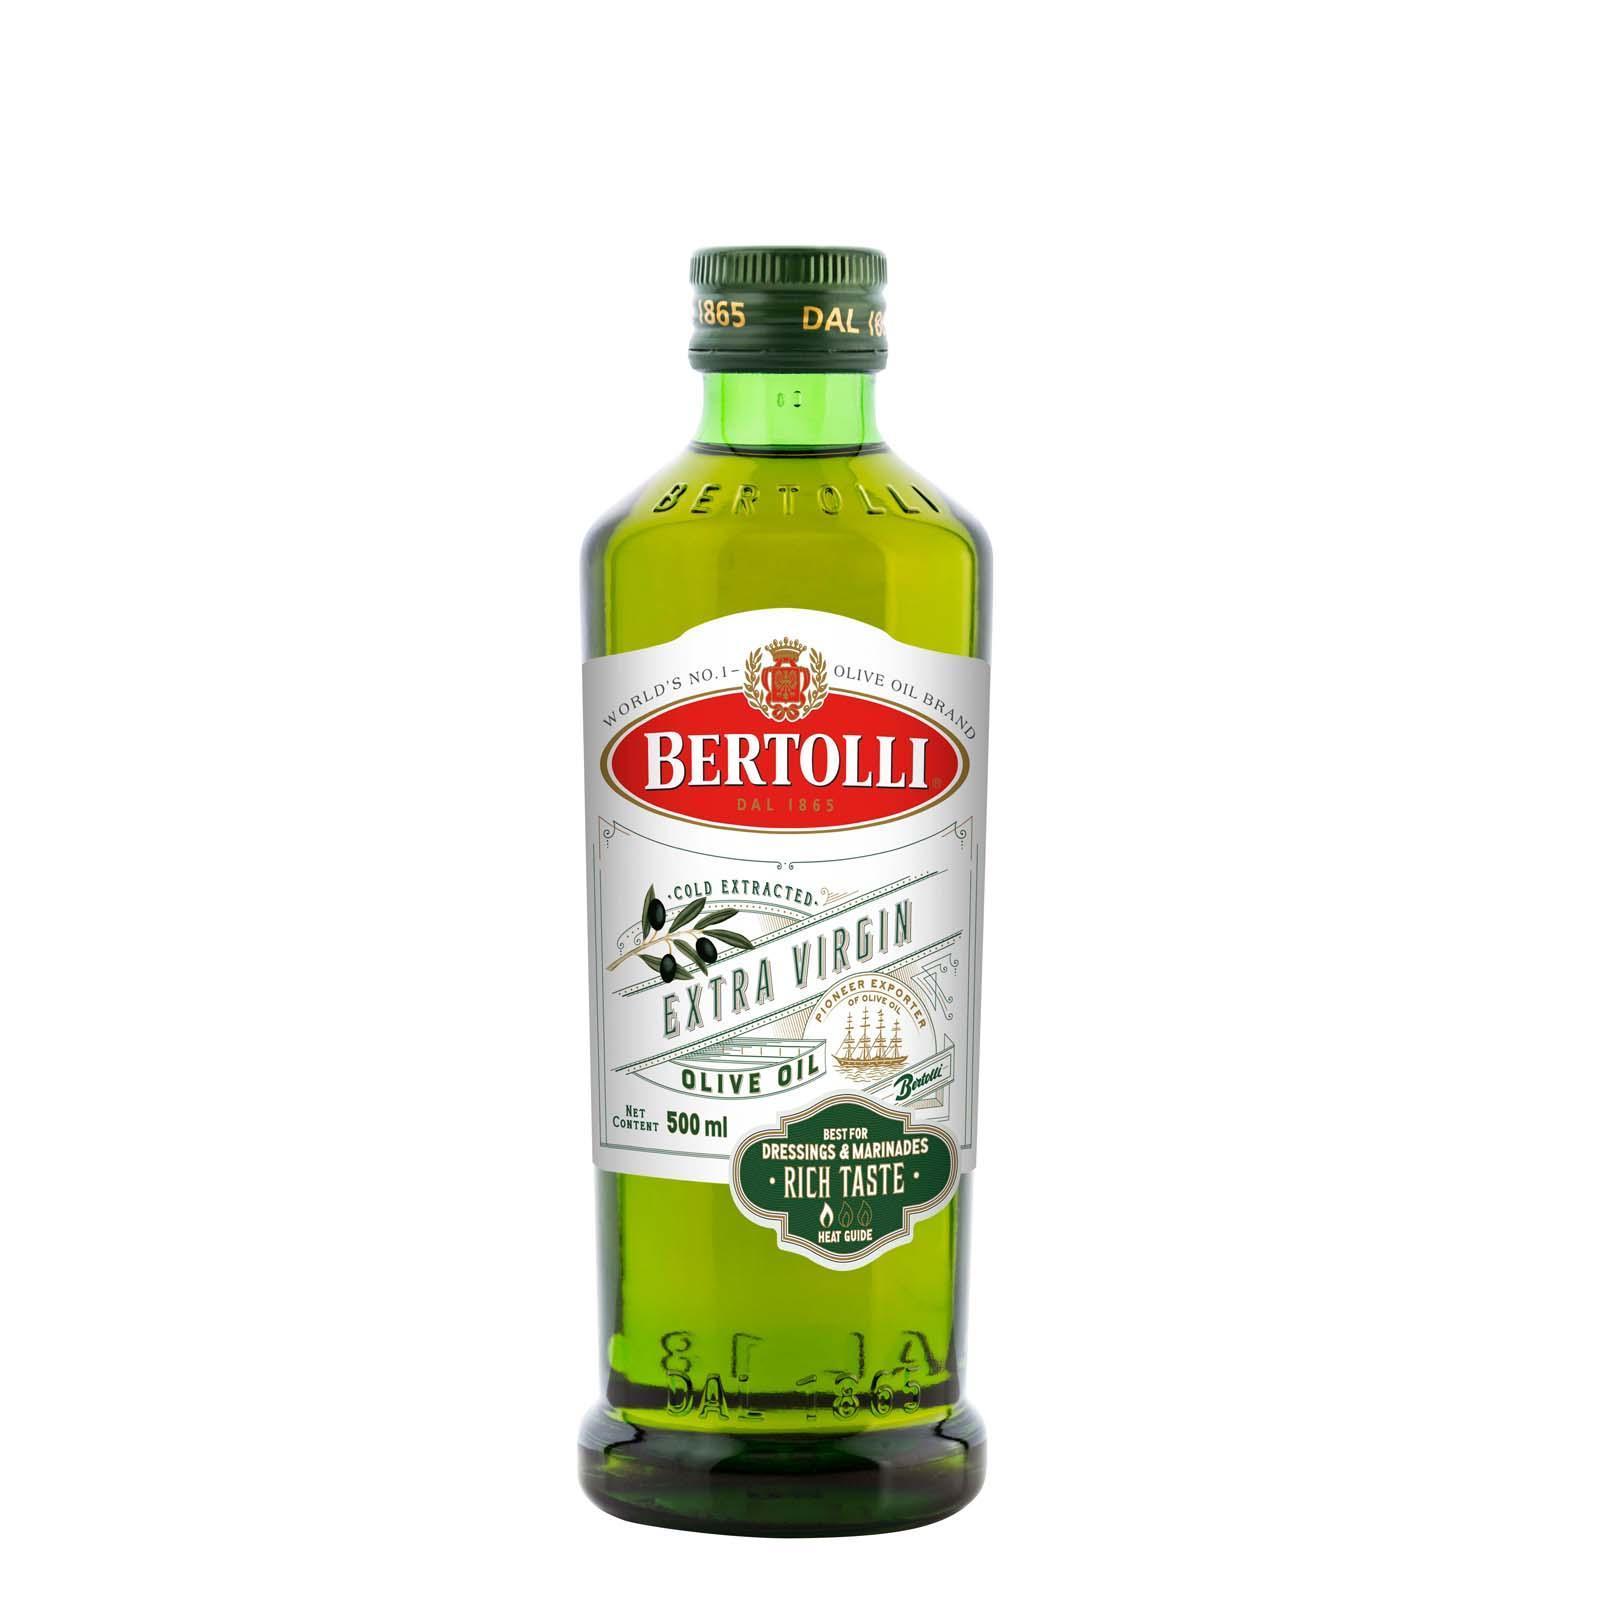 COLAVITA Classic Greek Extra Virgin Olive Oil 500ml